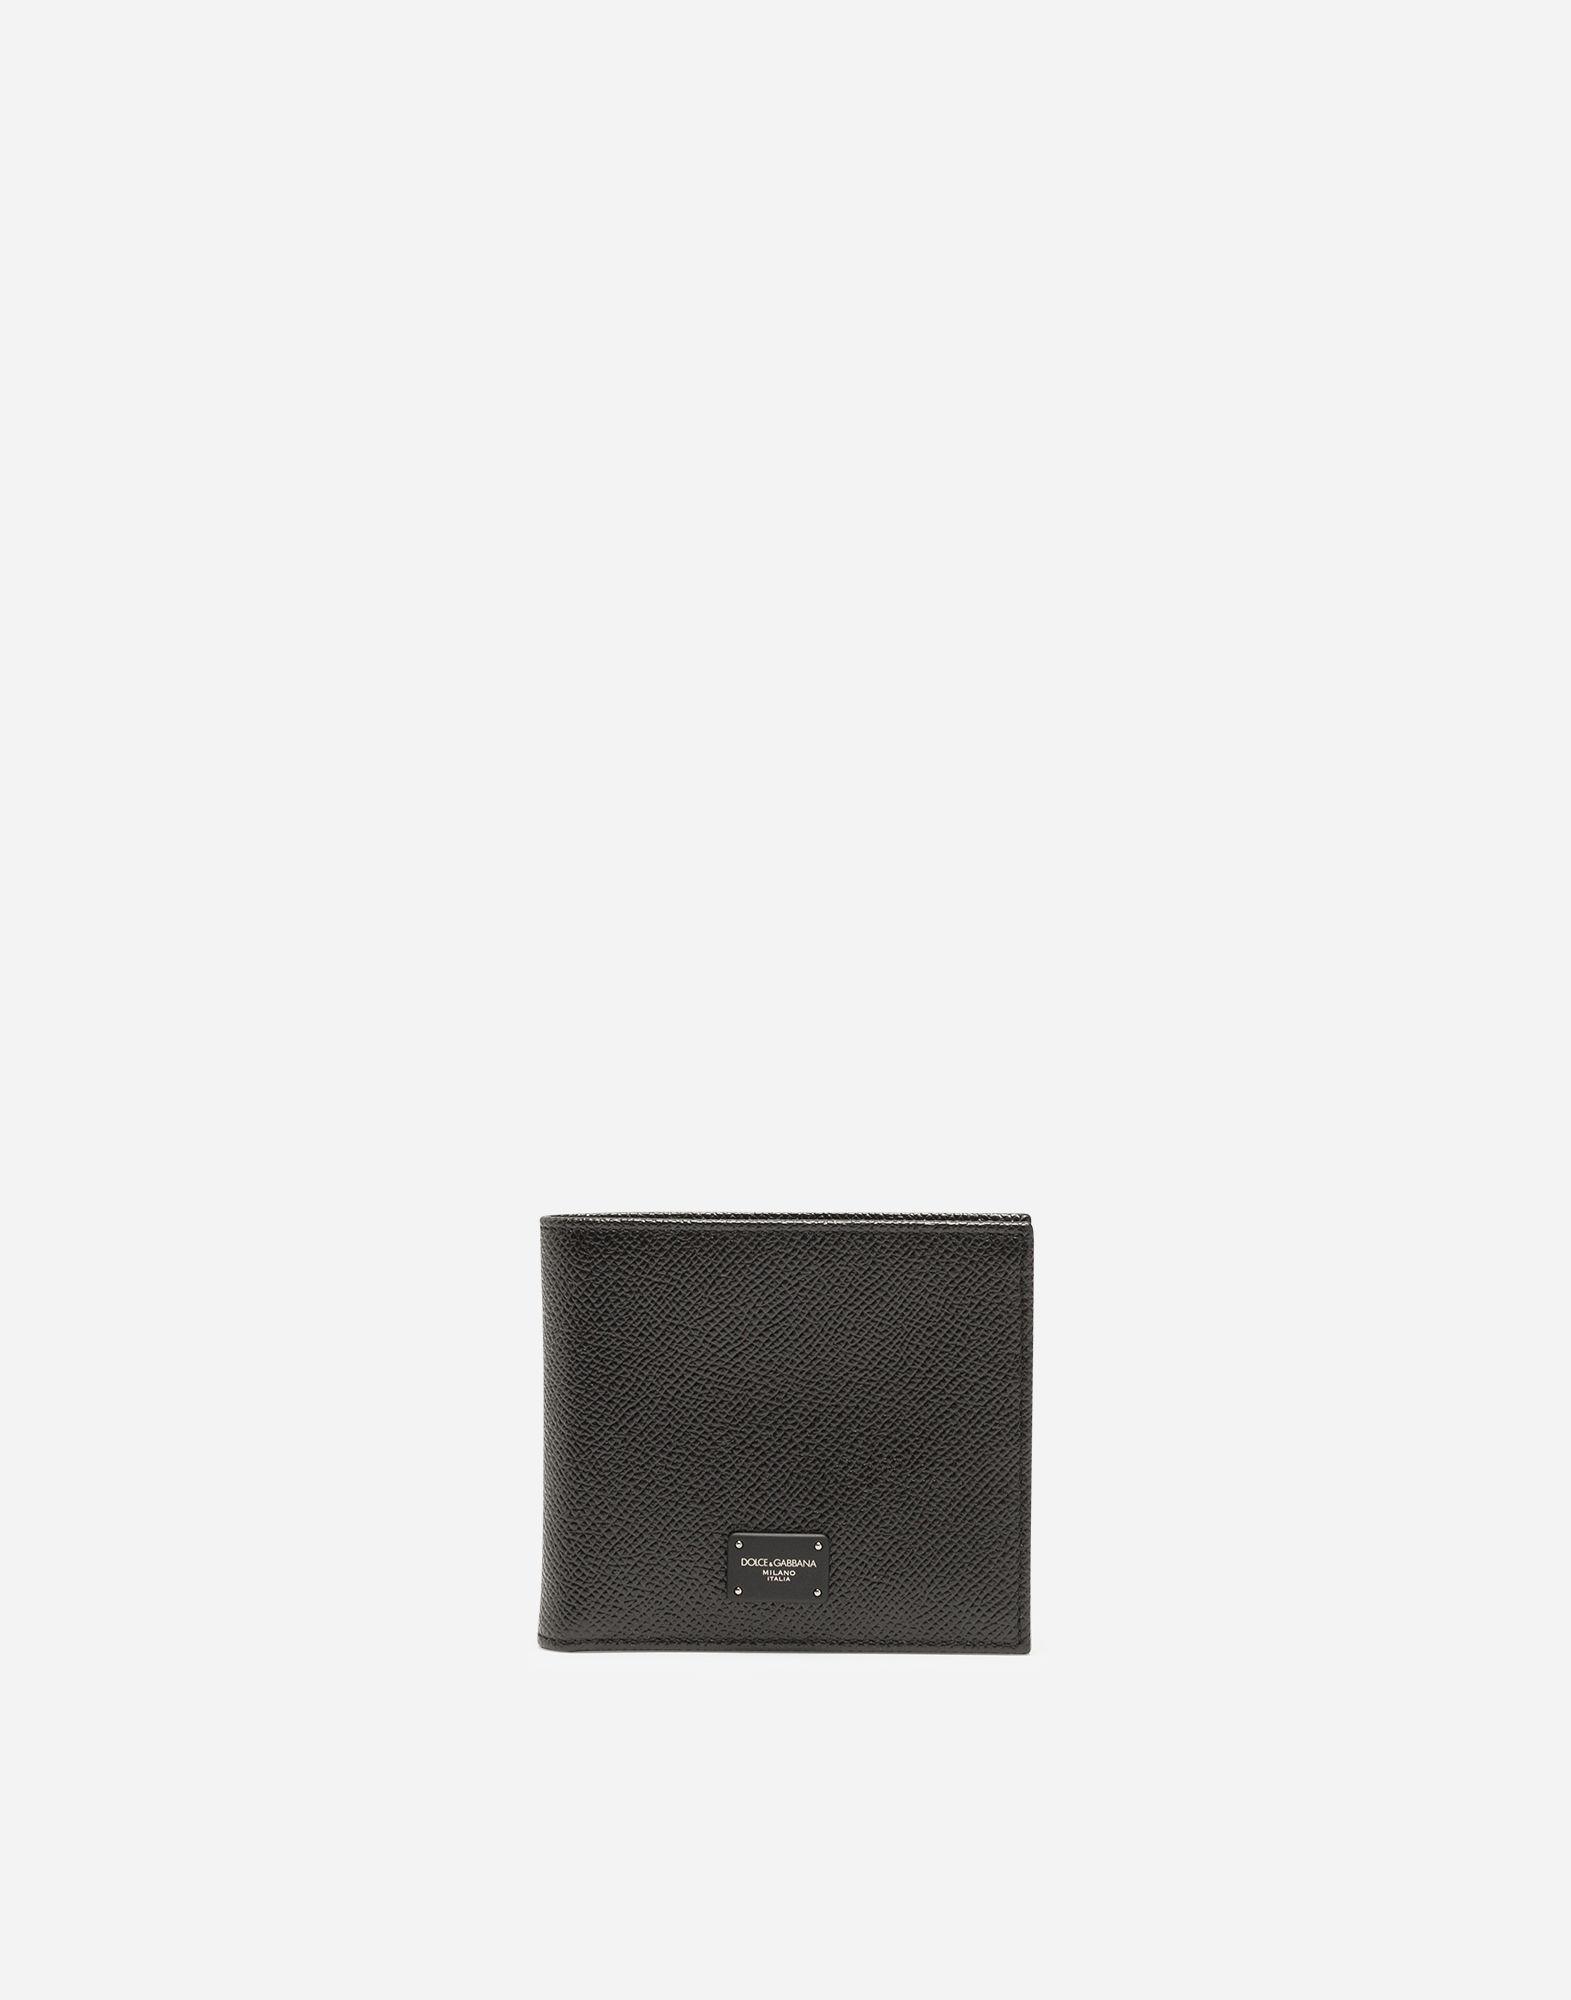 f47185e5d1 Lyst - Dolce & Gabbana Dauphine Calfskin Wallet in Black for Men